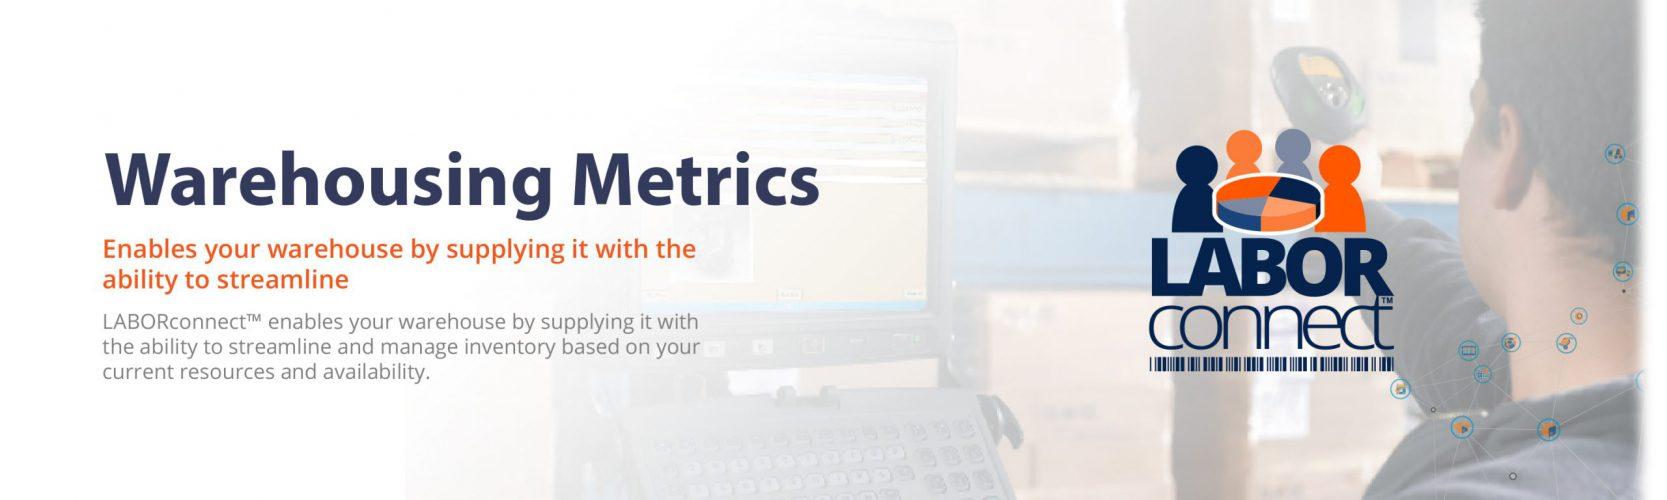 Wmetrics_Header_Content